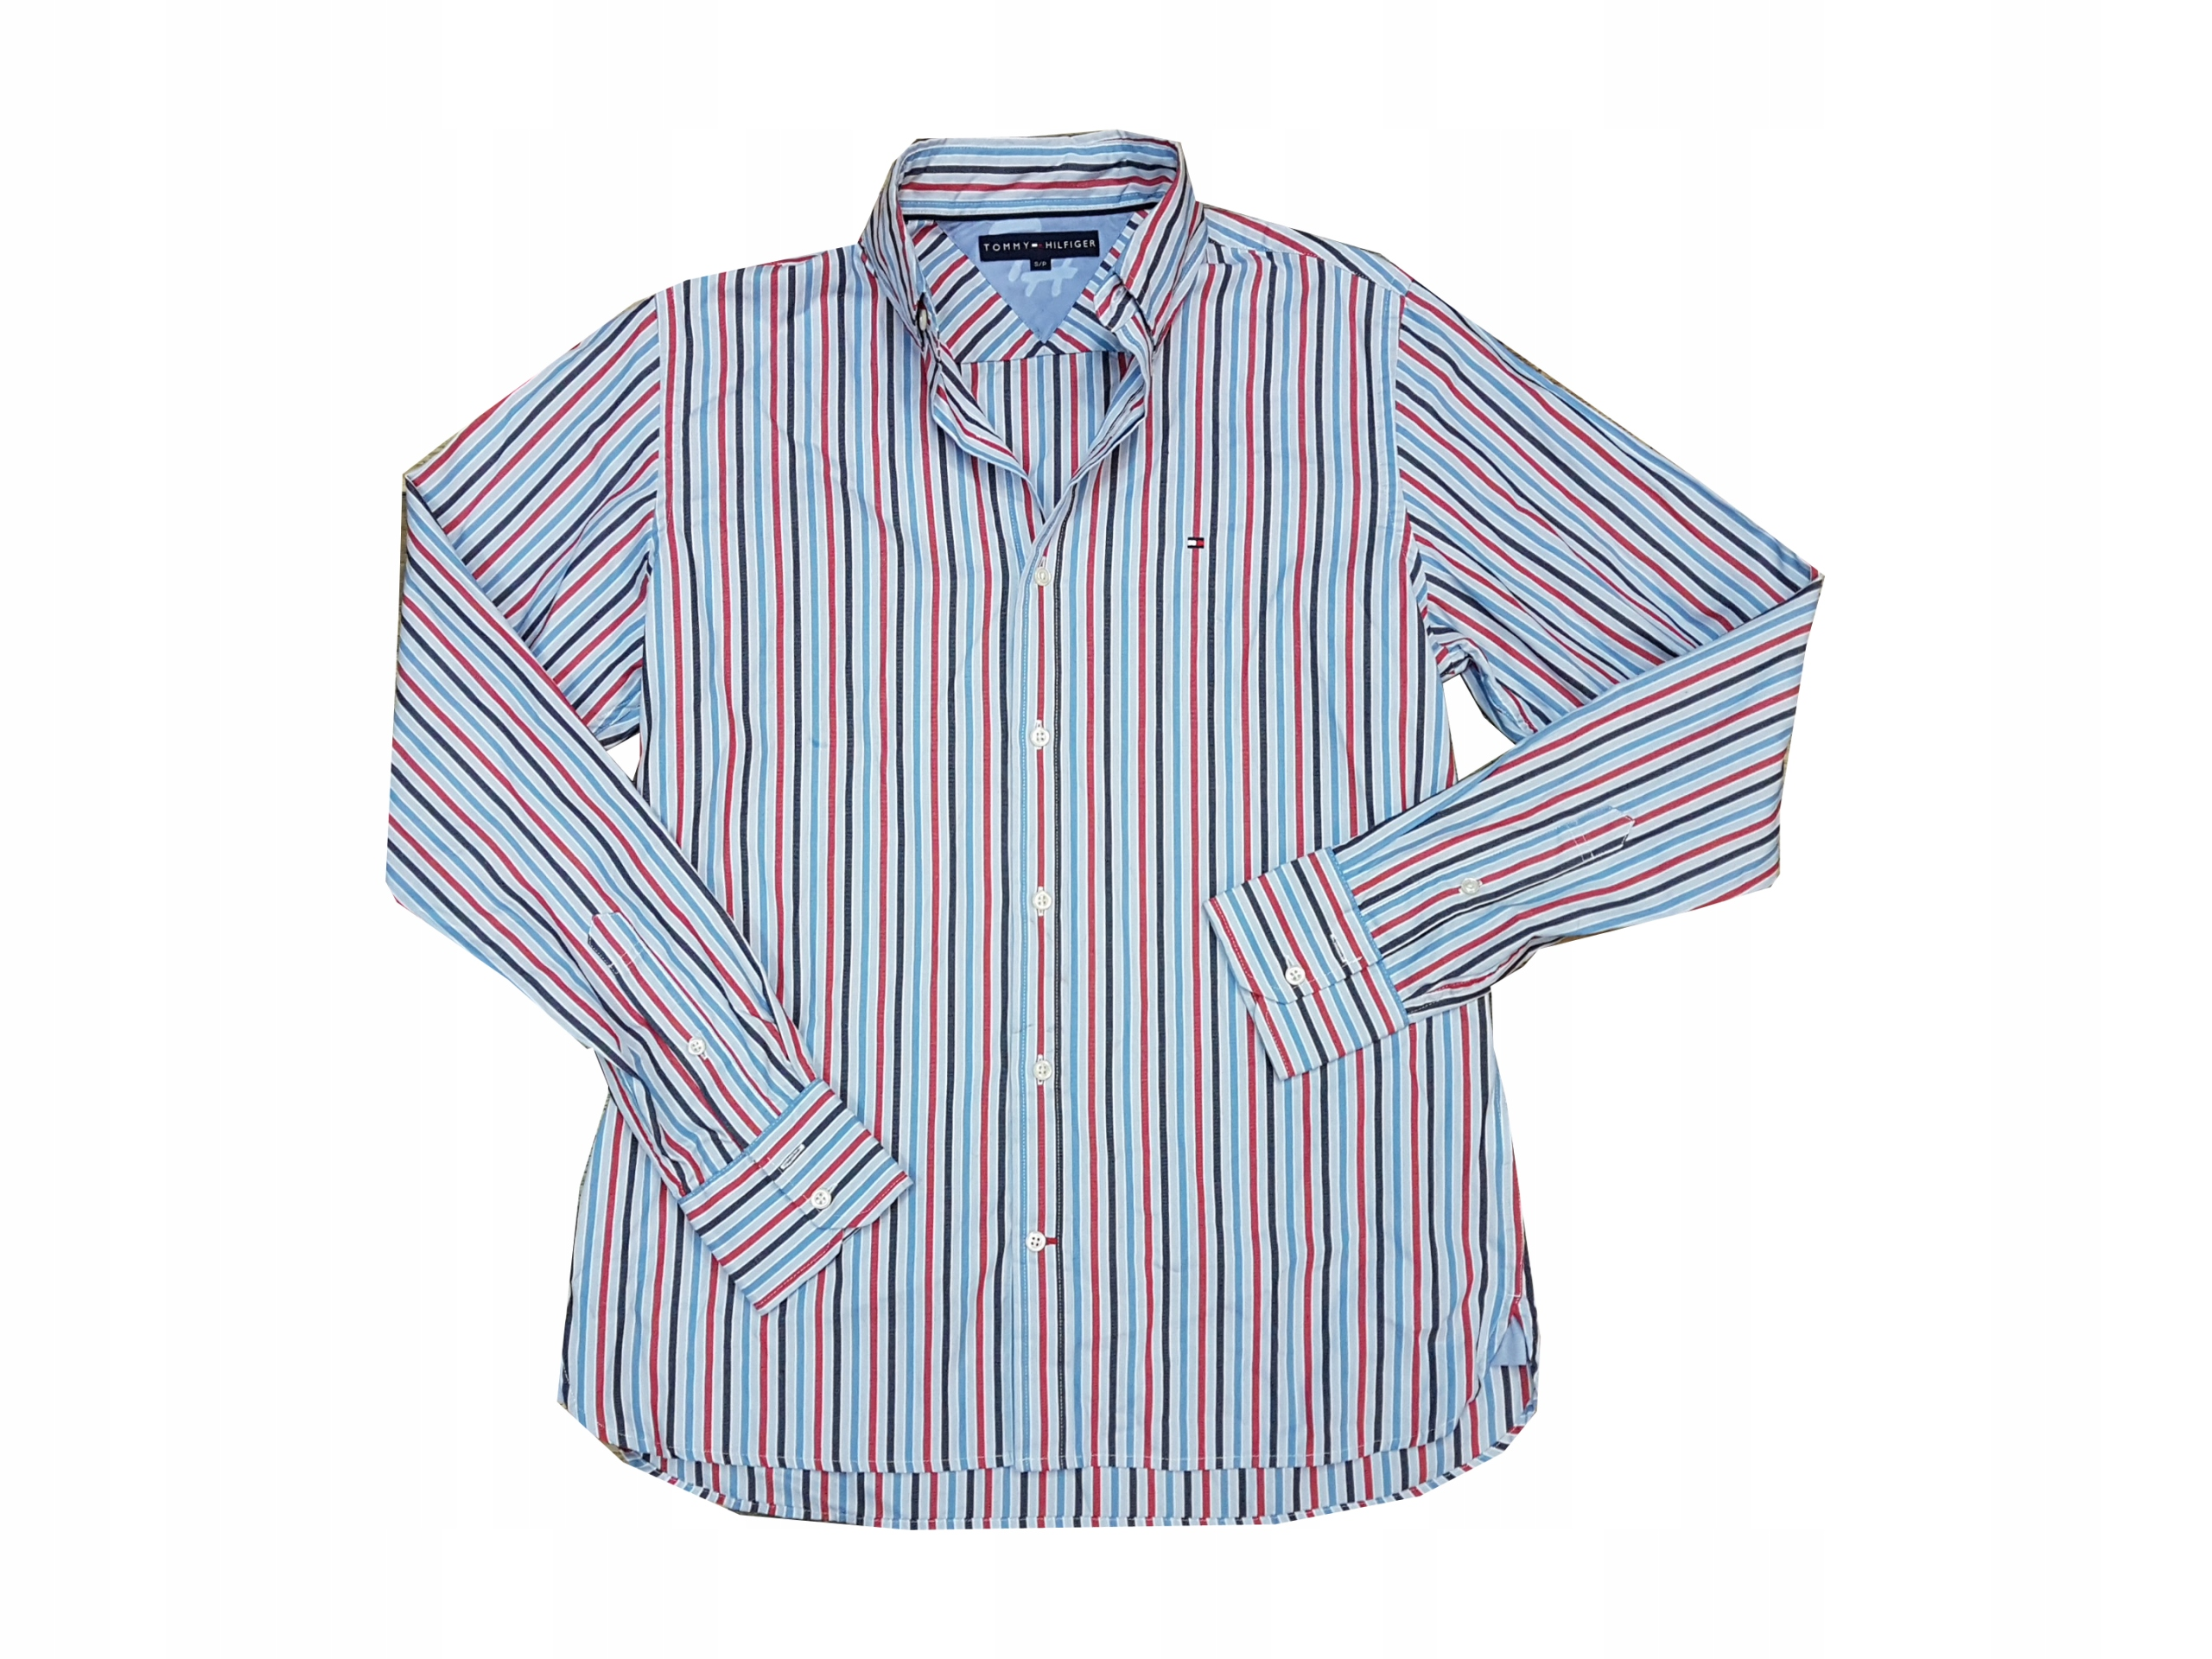 TOMMY HILFIGER koszula męska w paski Slim Fit S